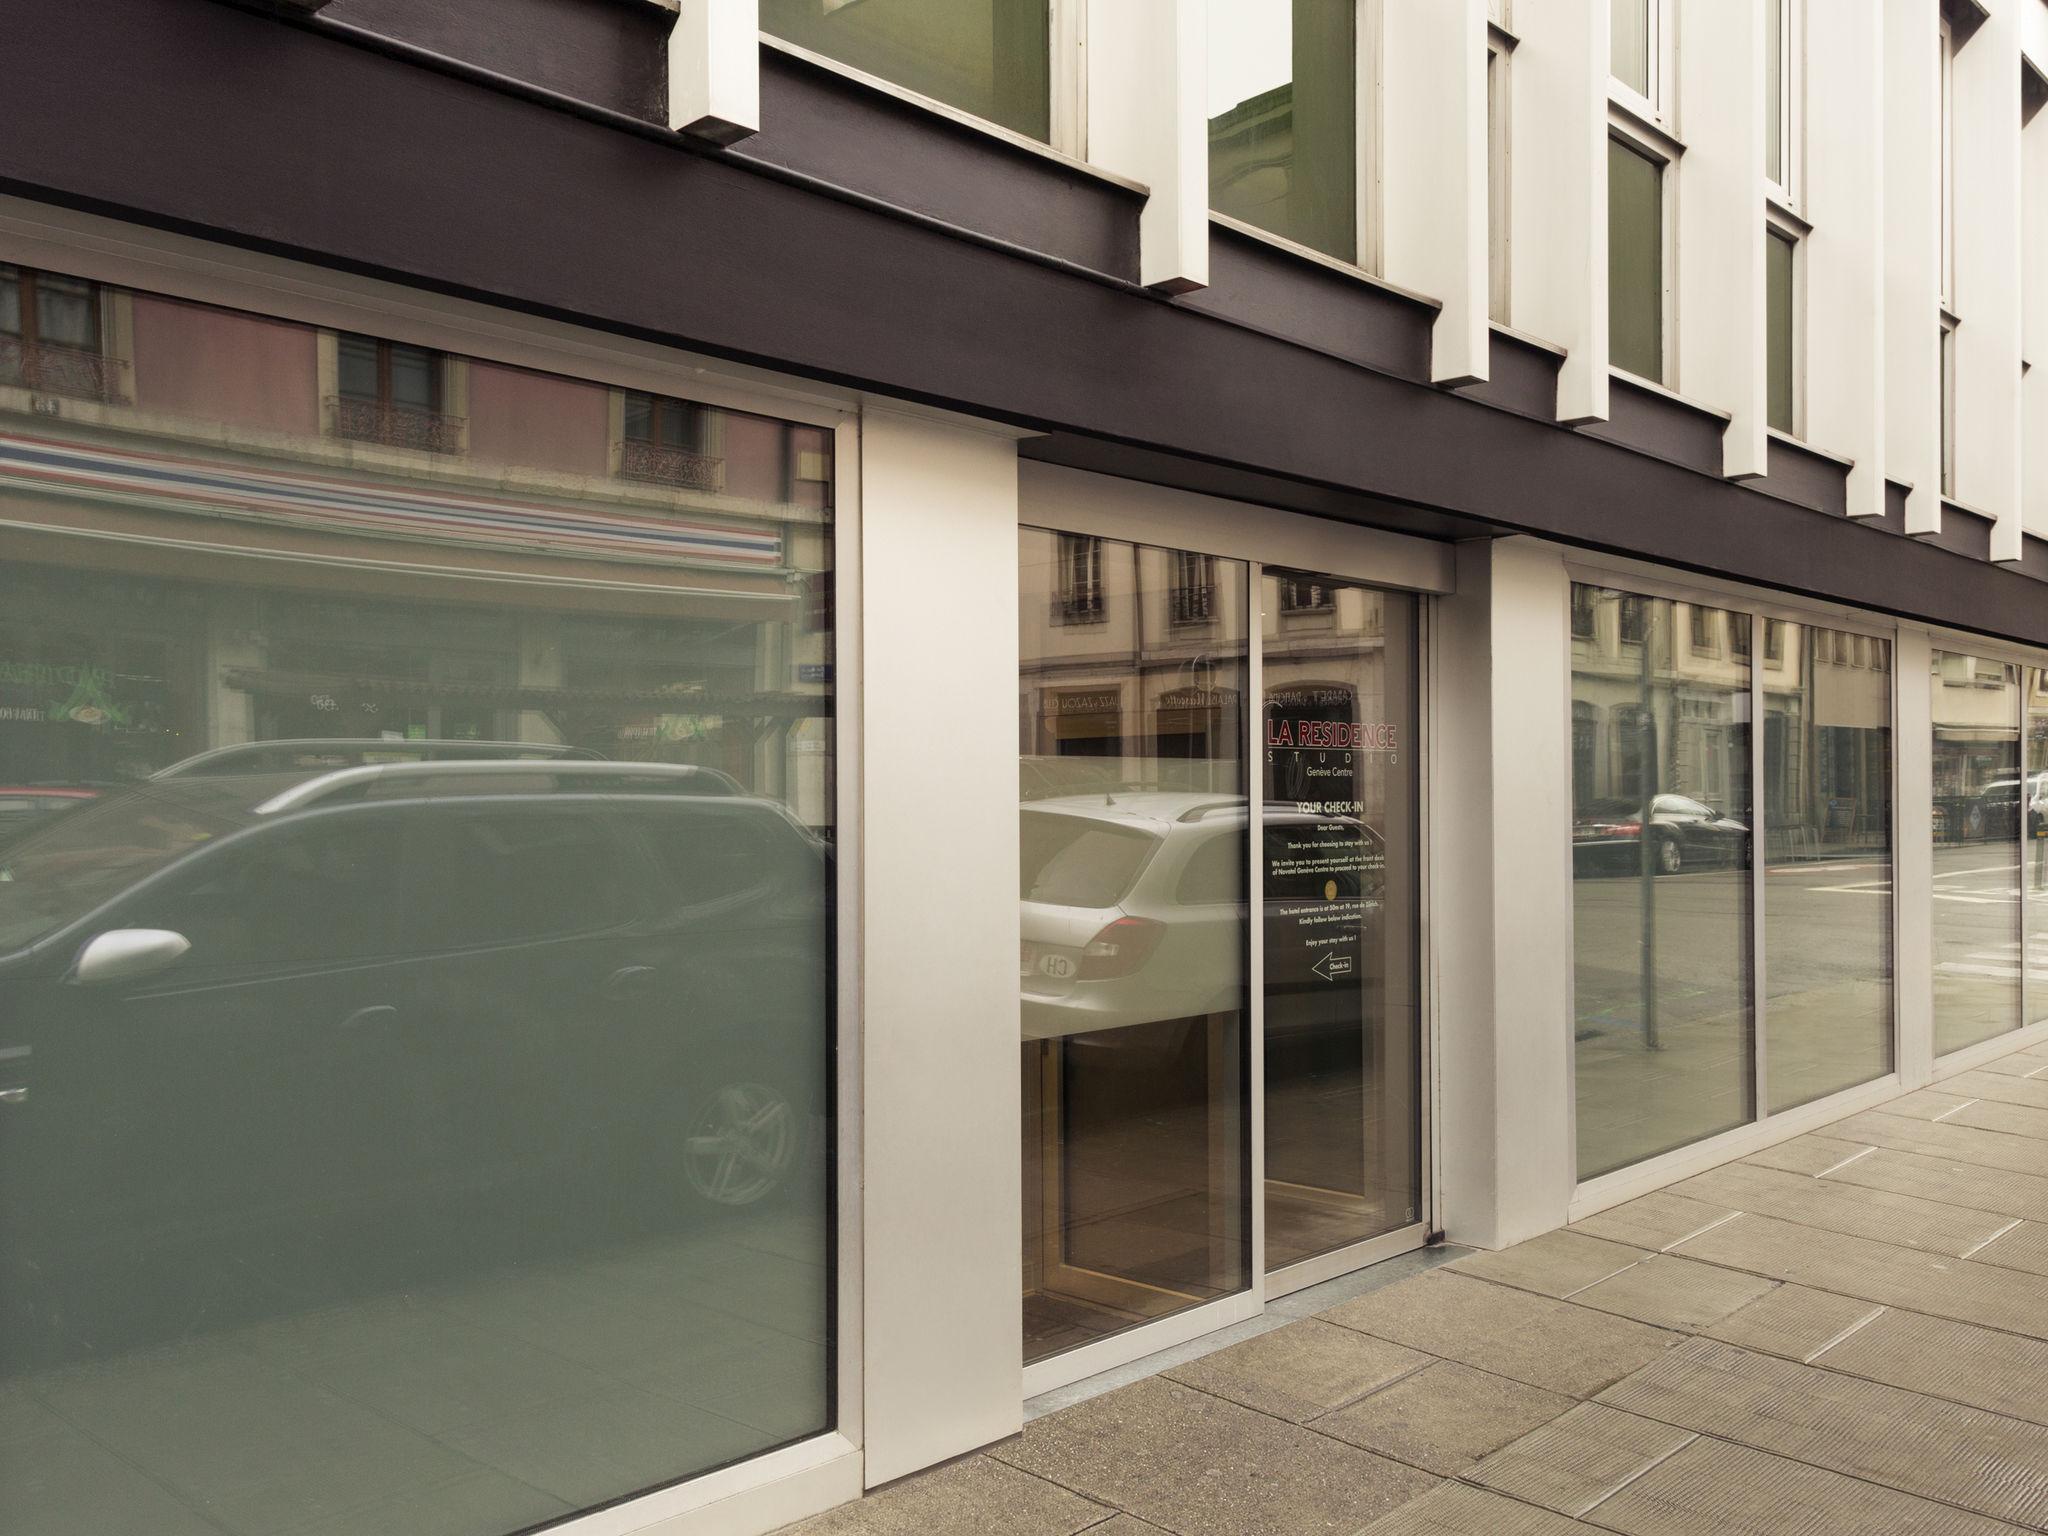 accor suite hotel geneve. Black Bedroom Furniture Sets. Home Design Ideas